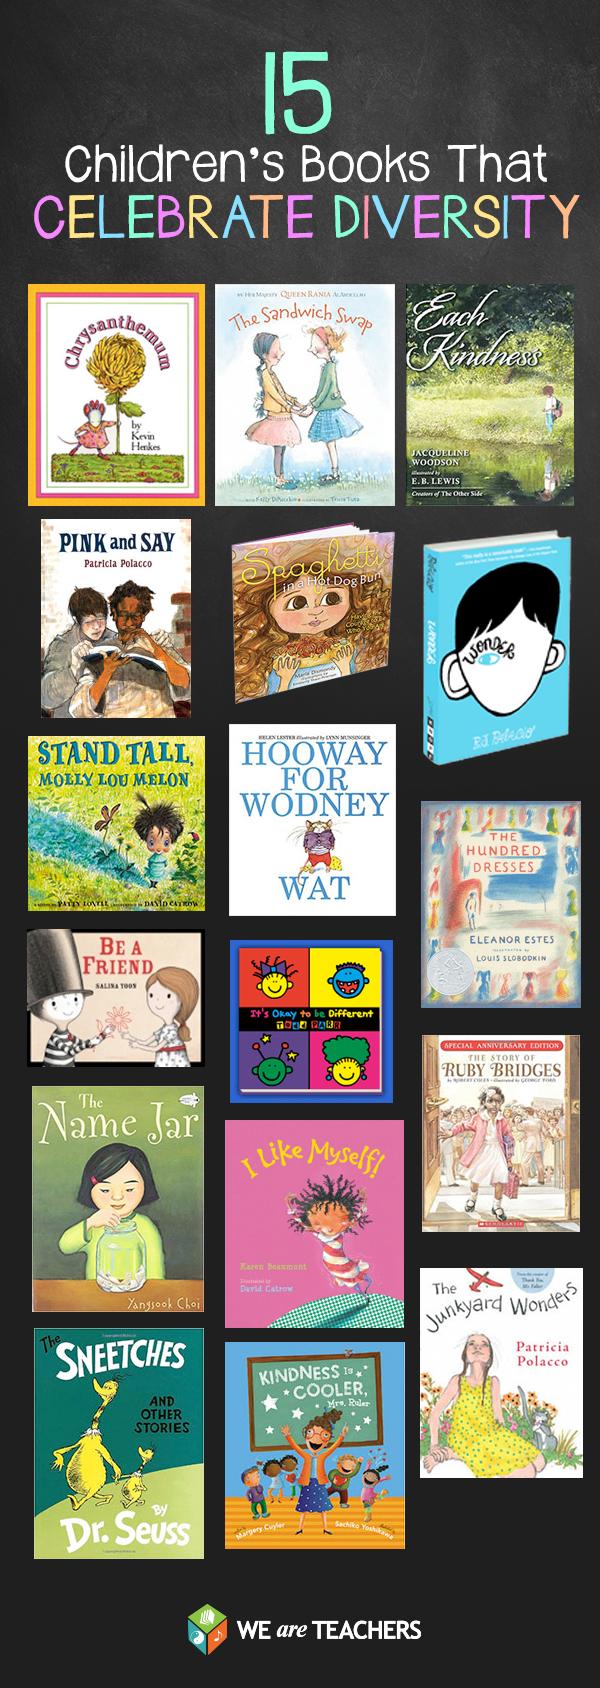 diversity-books